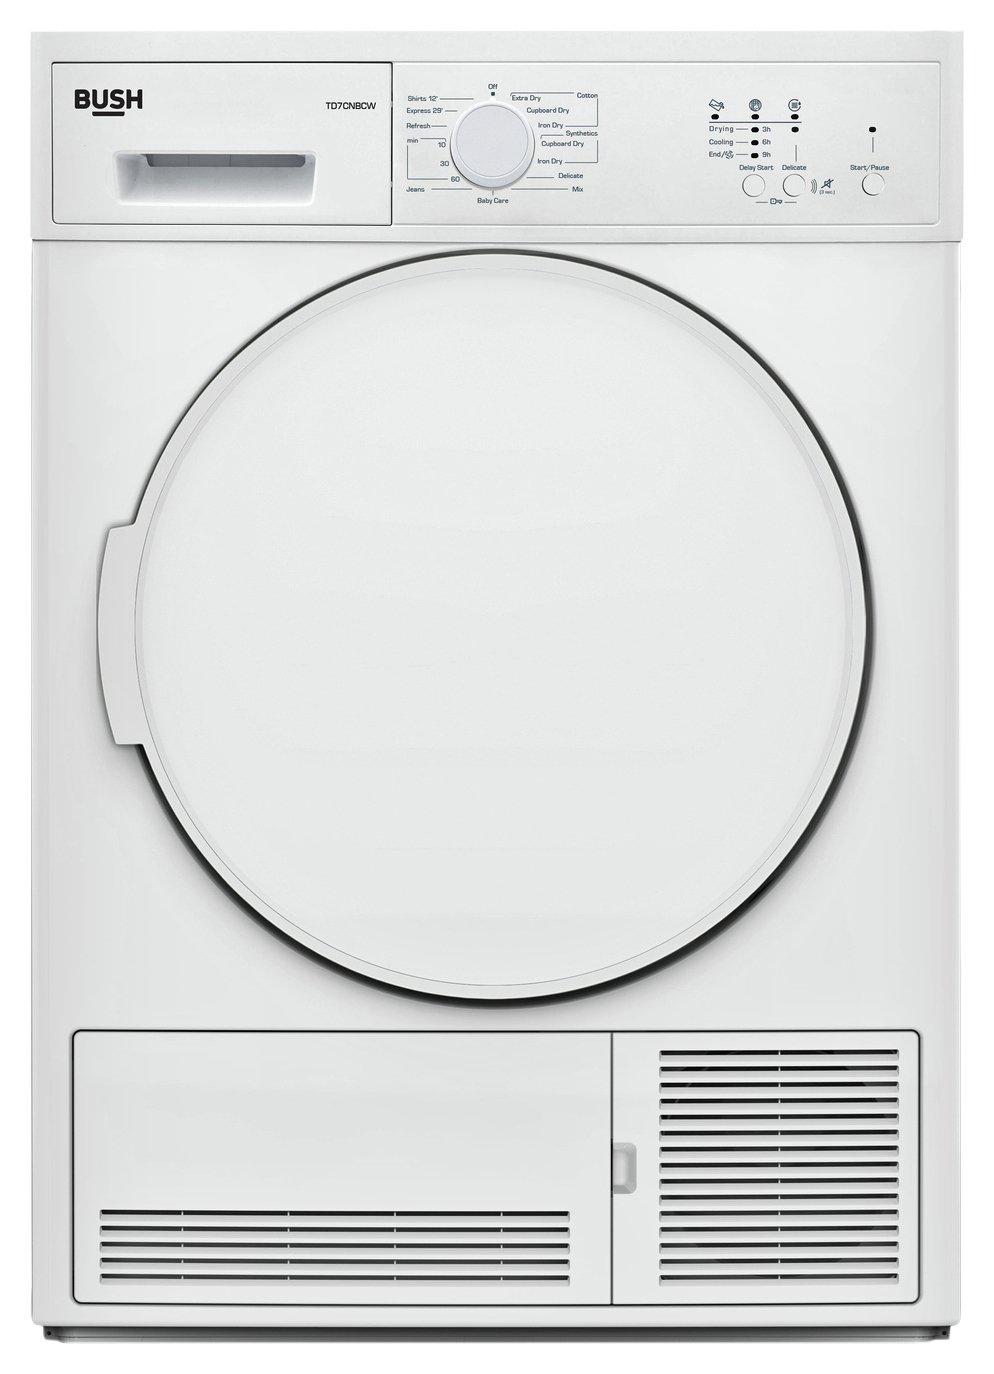 Bush TD7CNBCW White 7KG Condenser Tumble Dryer